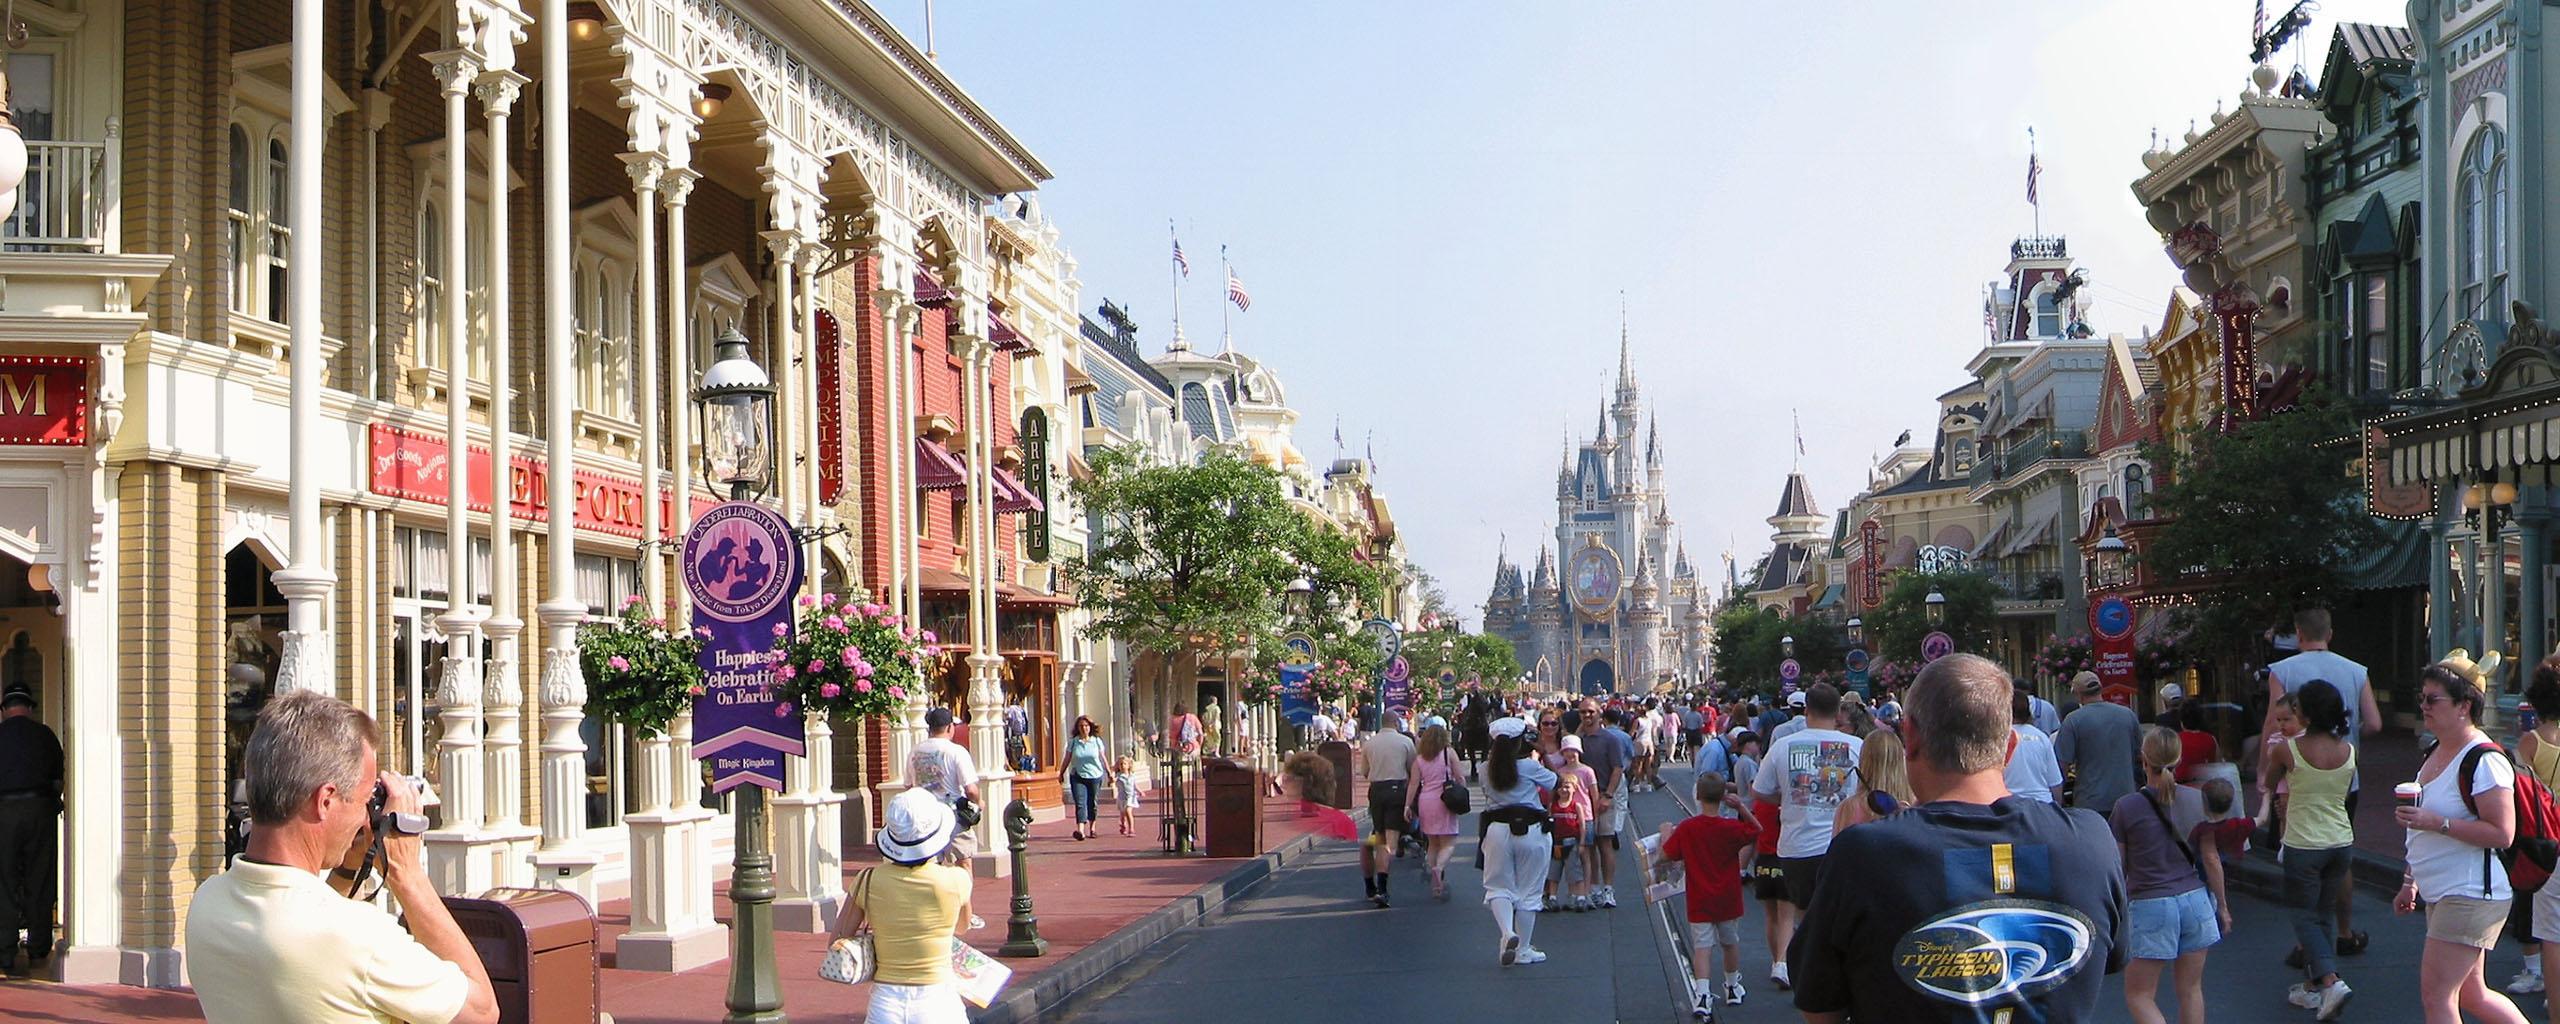 Panoramic Disneyland and Disneyworld Pictures Satellite Maps 2560x1024